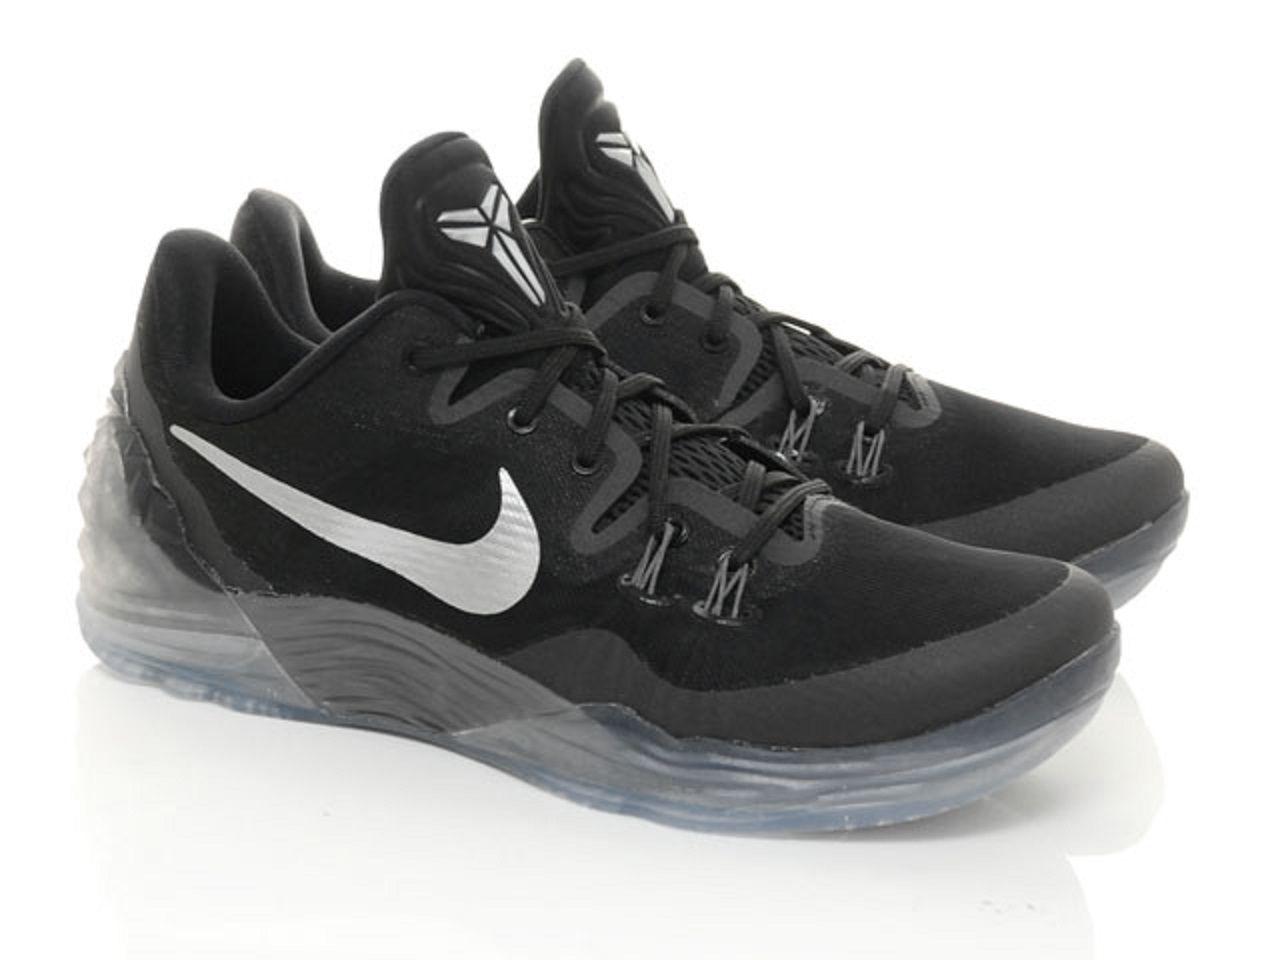 the best attitude eb869 bd3d5 ... Nike Zoom Kobe Venomenon 5 EP Limit Black Basketball Shoes